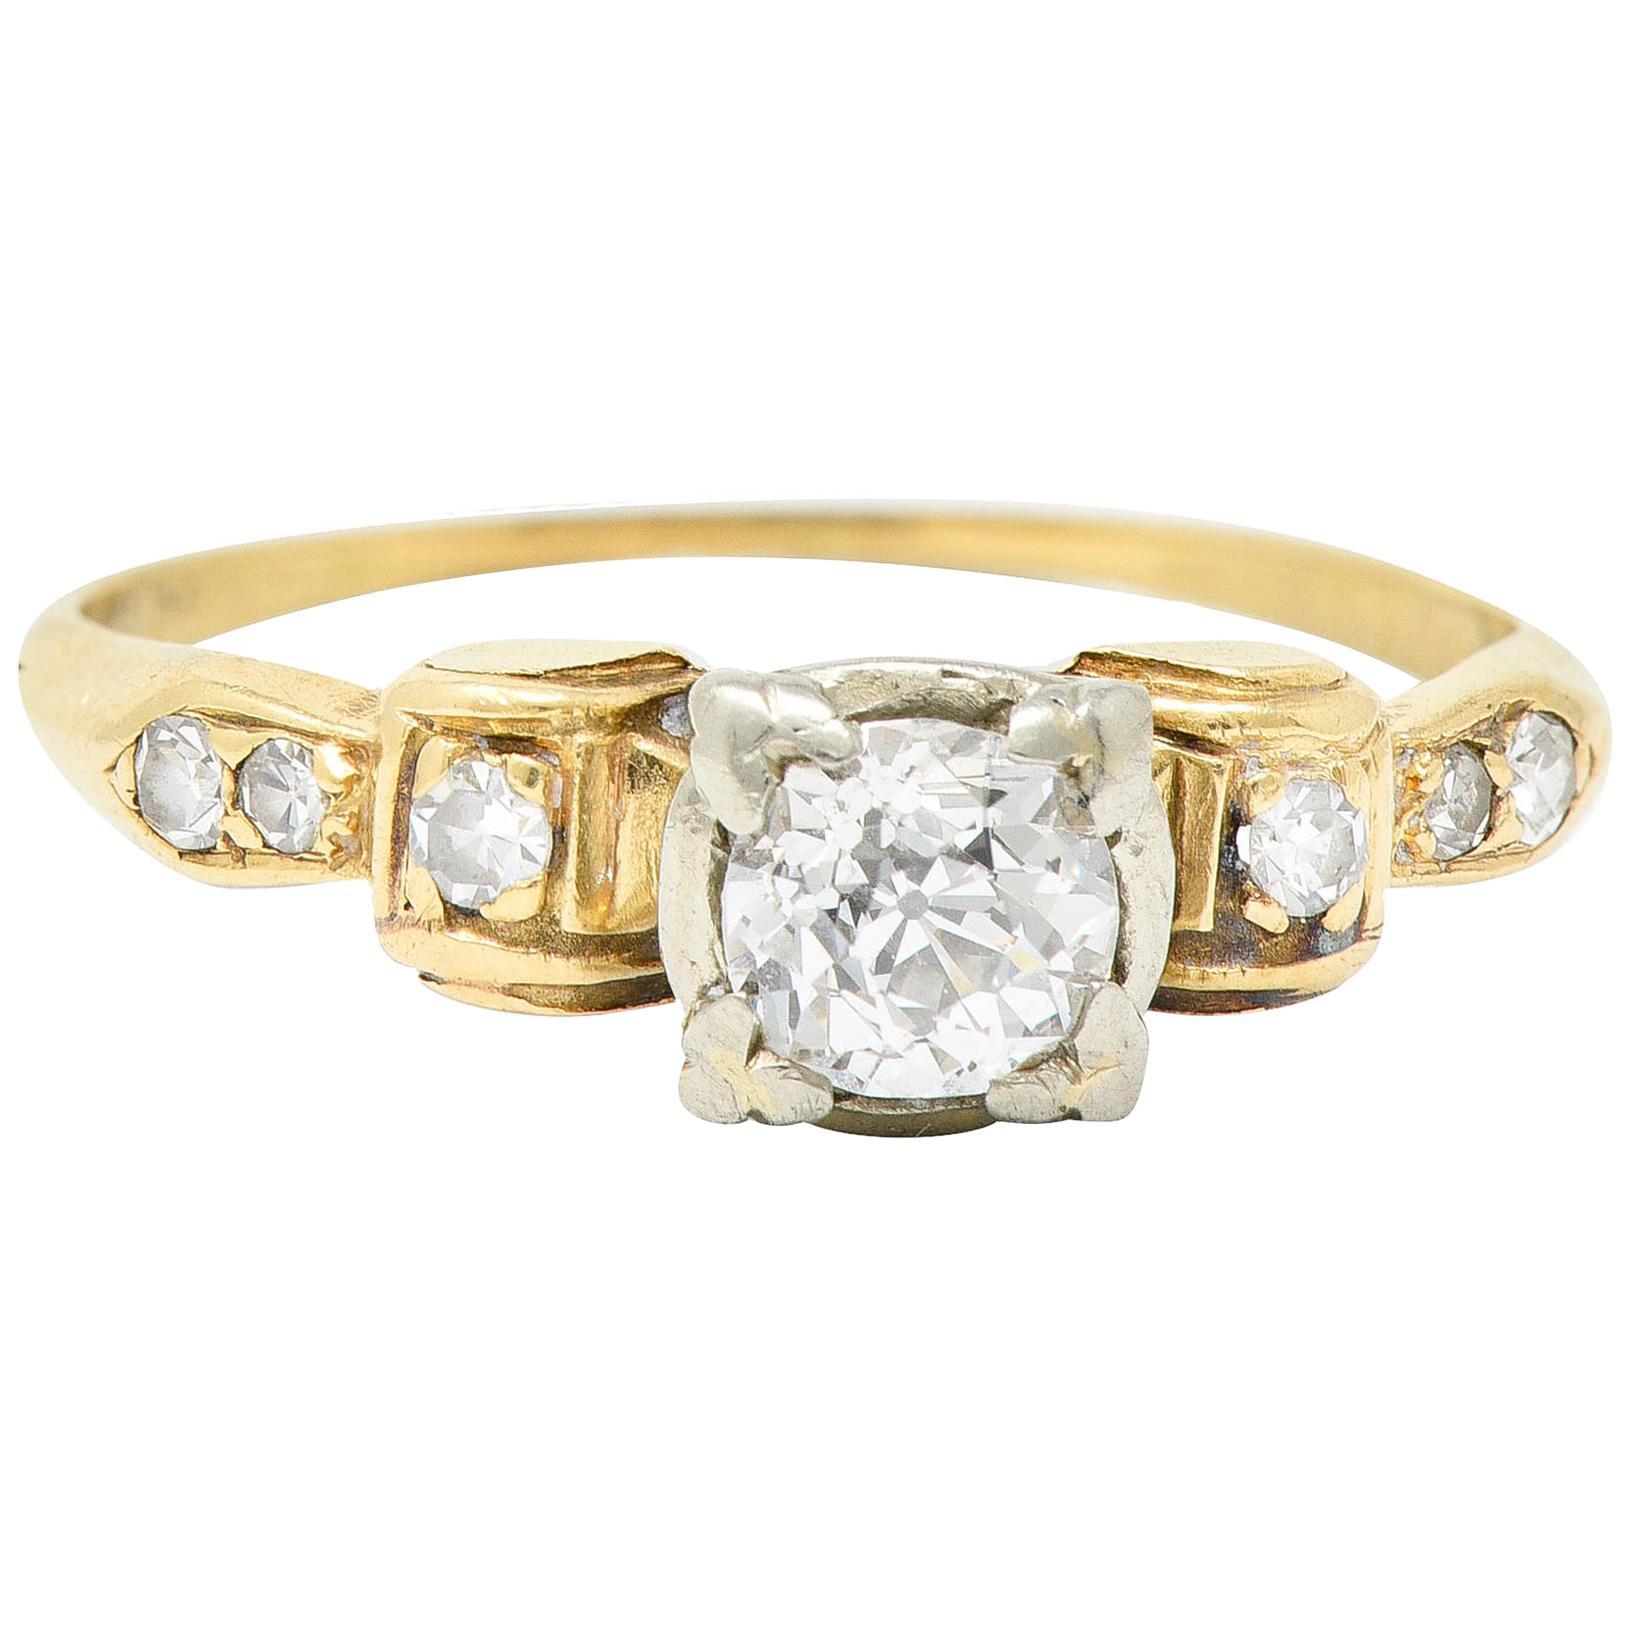 1940's Retro 0.50 Carat Diamond 14 Karat Two-Tone Gold Engagement Ring